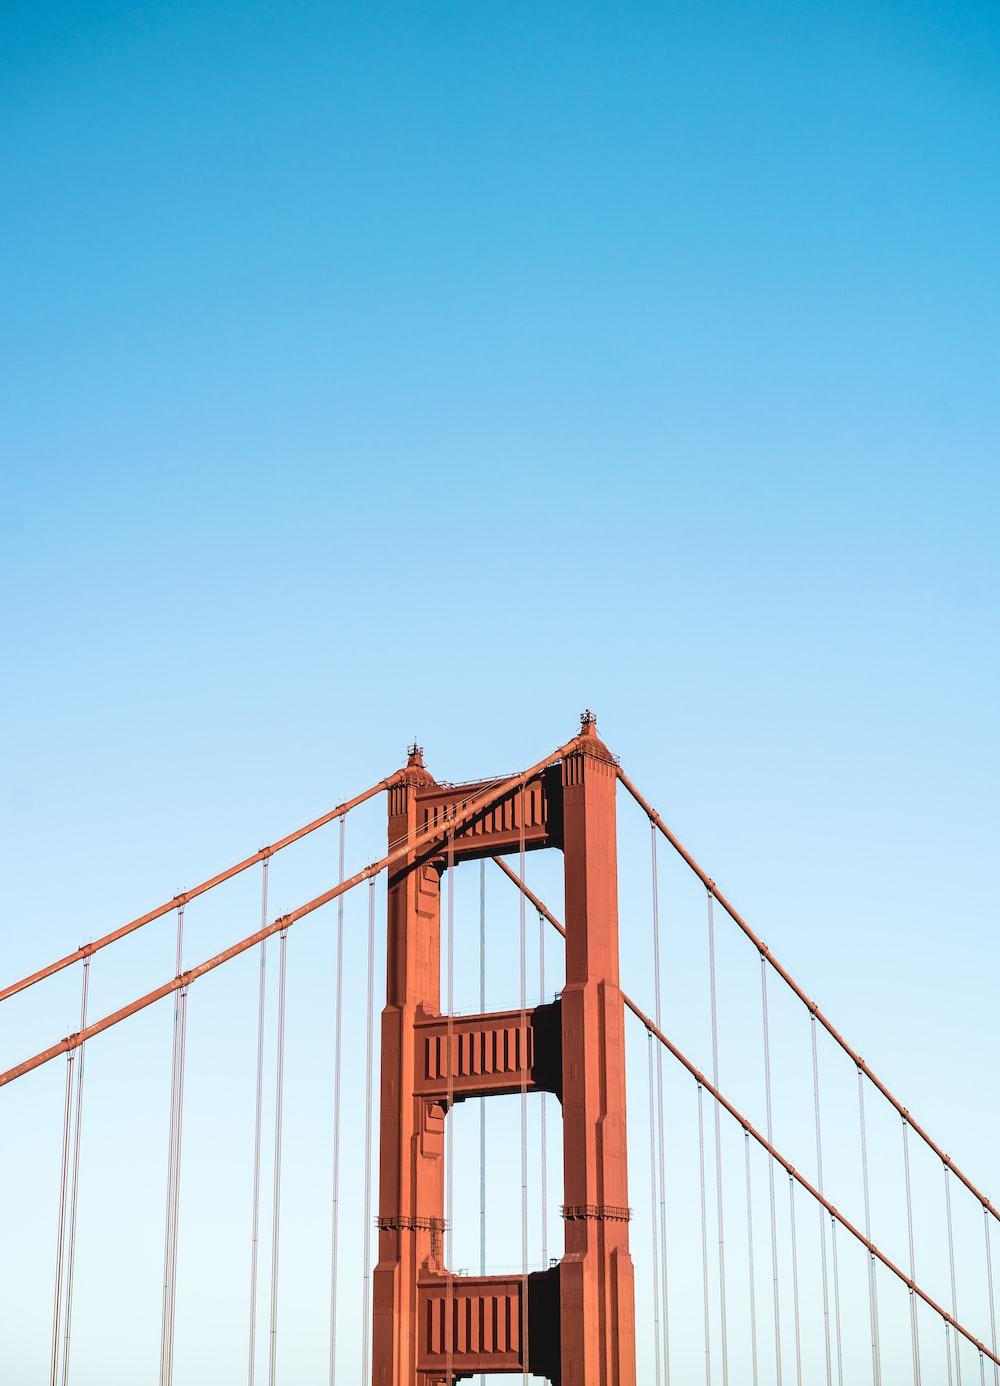 Golden Gate Bridge of San Francisco under calm blue sky